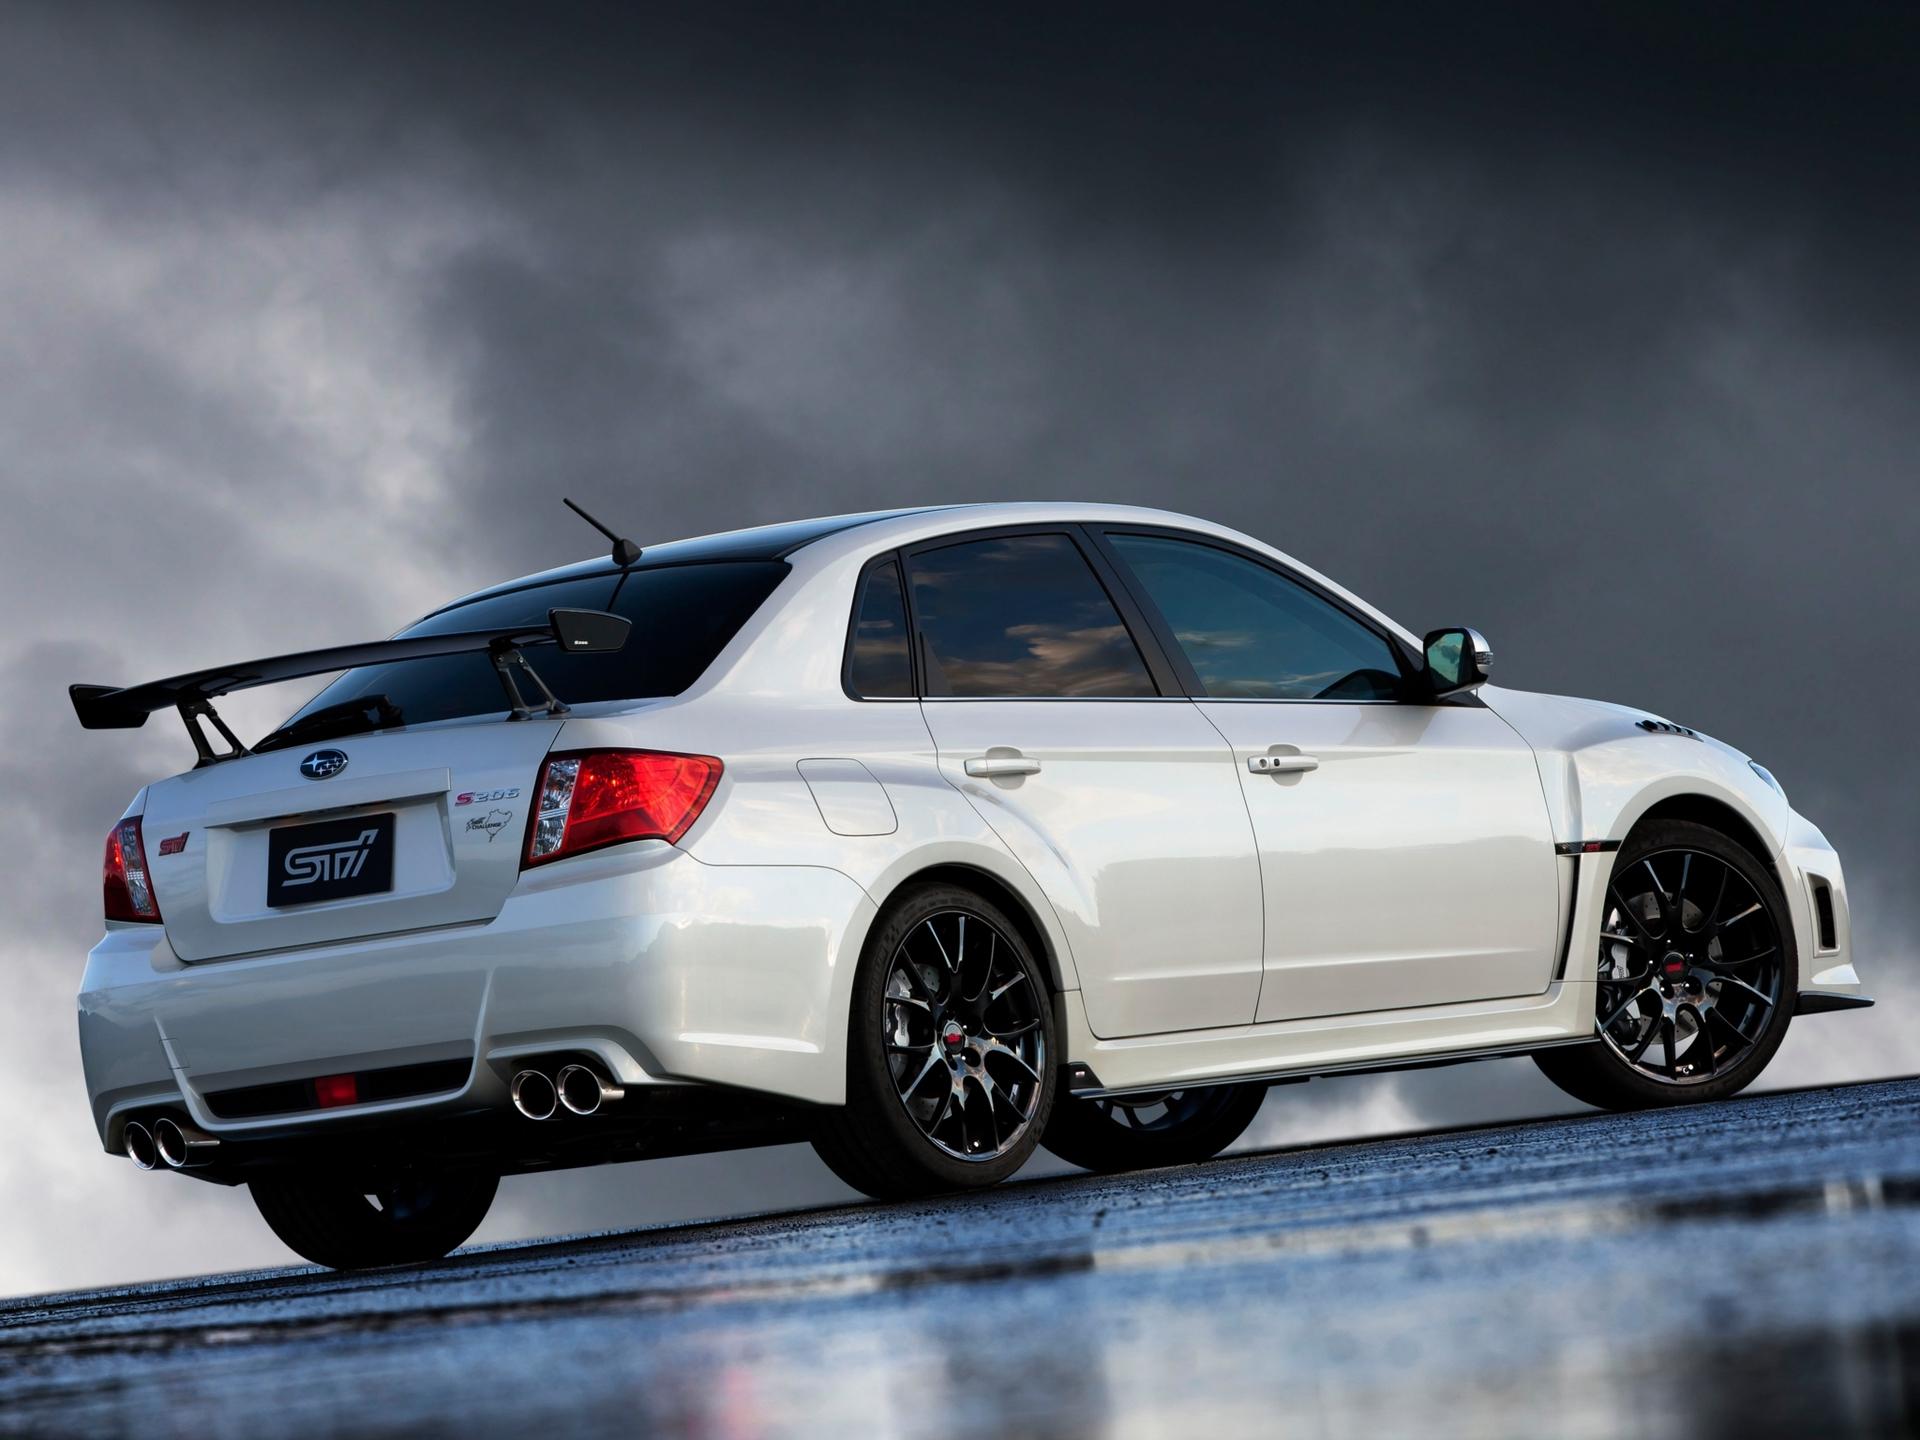 Subaru_Impreza_STI_S206_NBR_Challenge_Package_0002